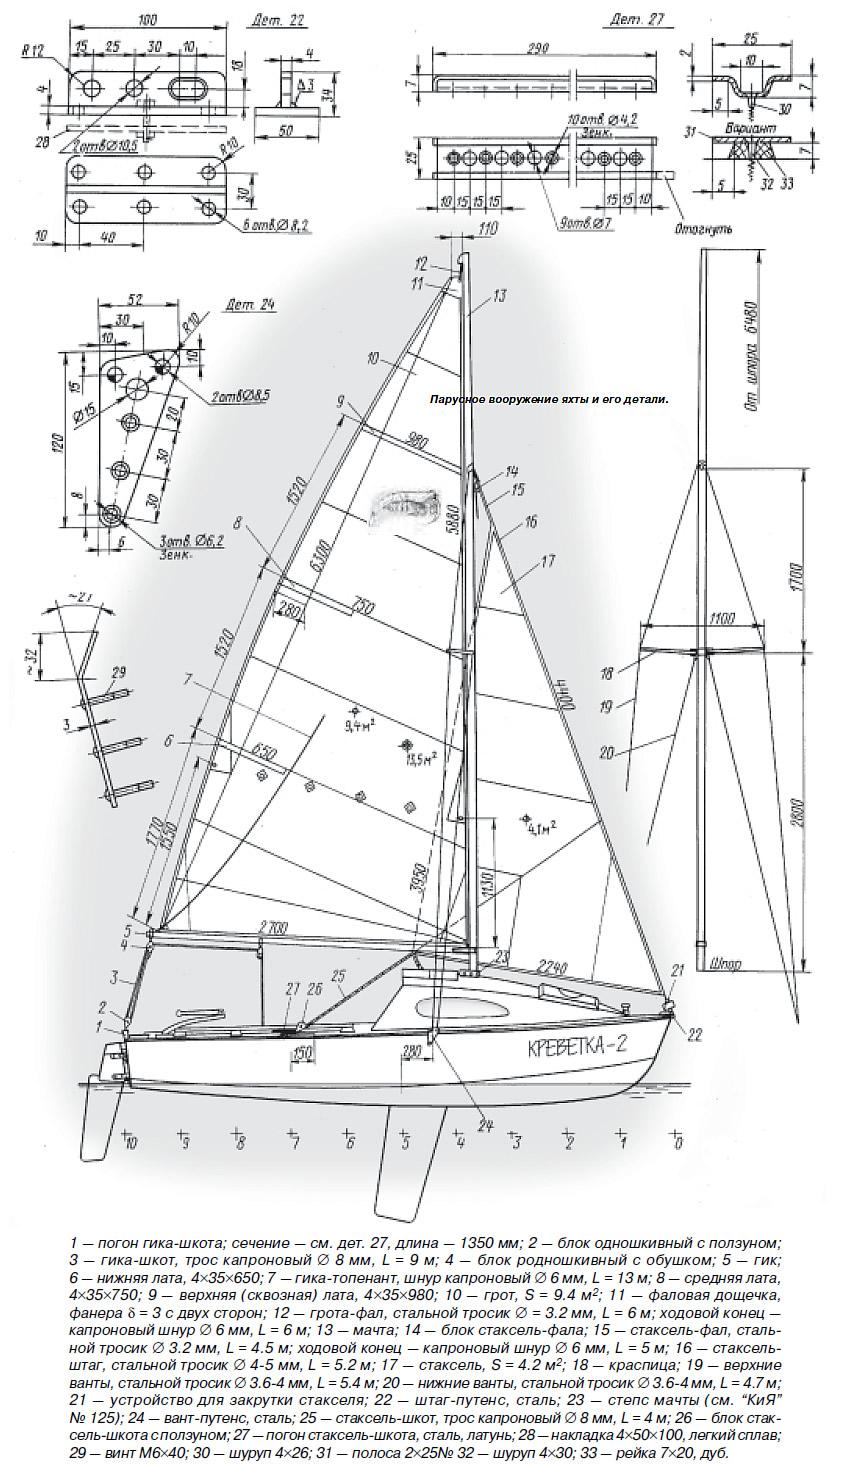 лодку и его детали